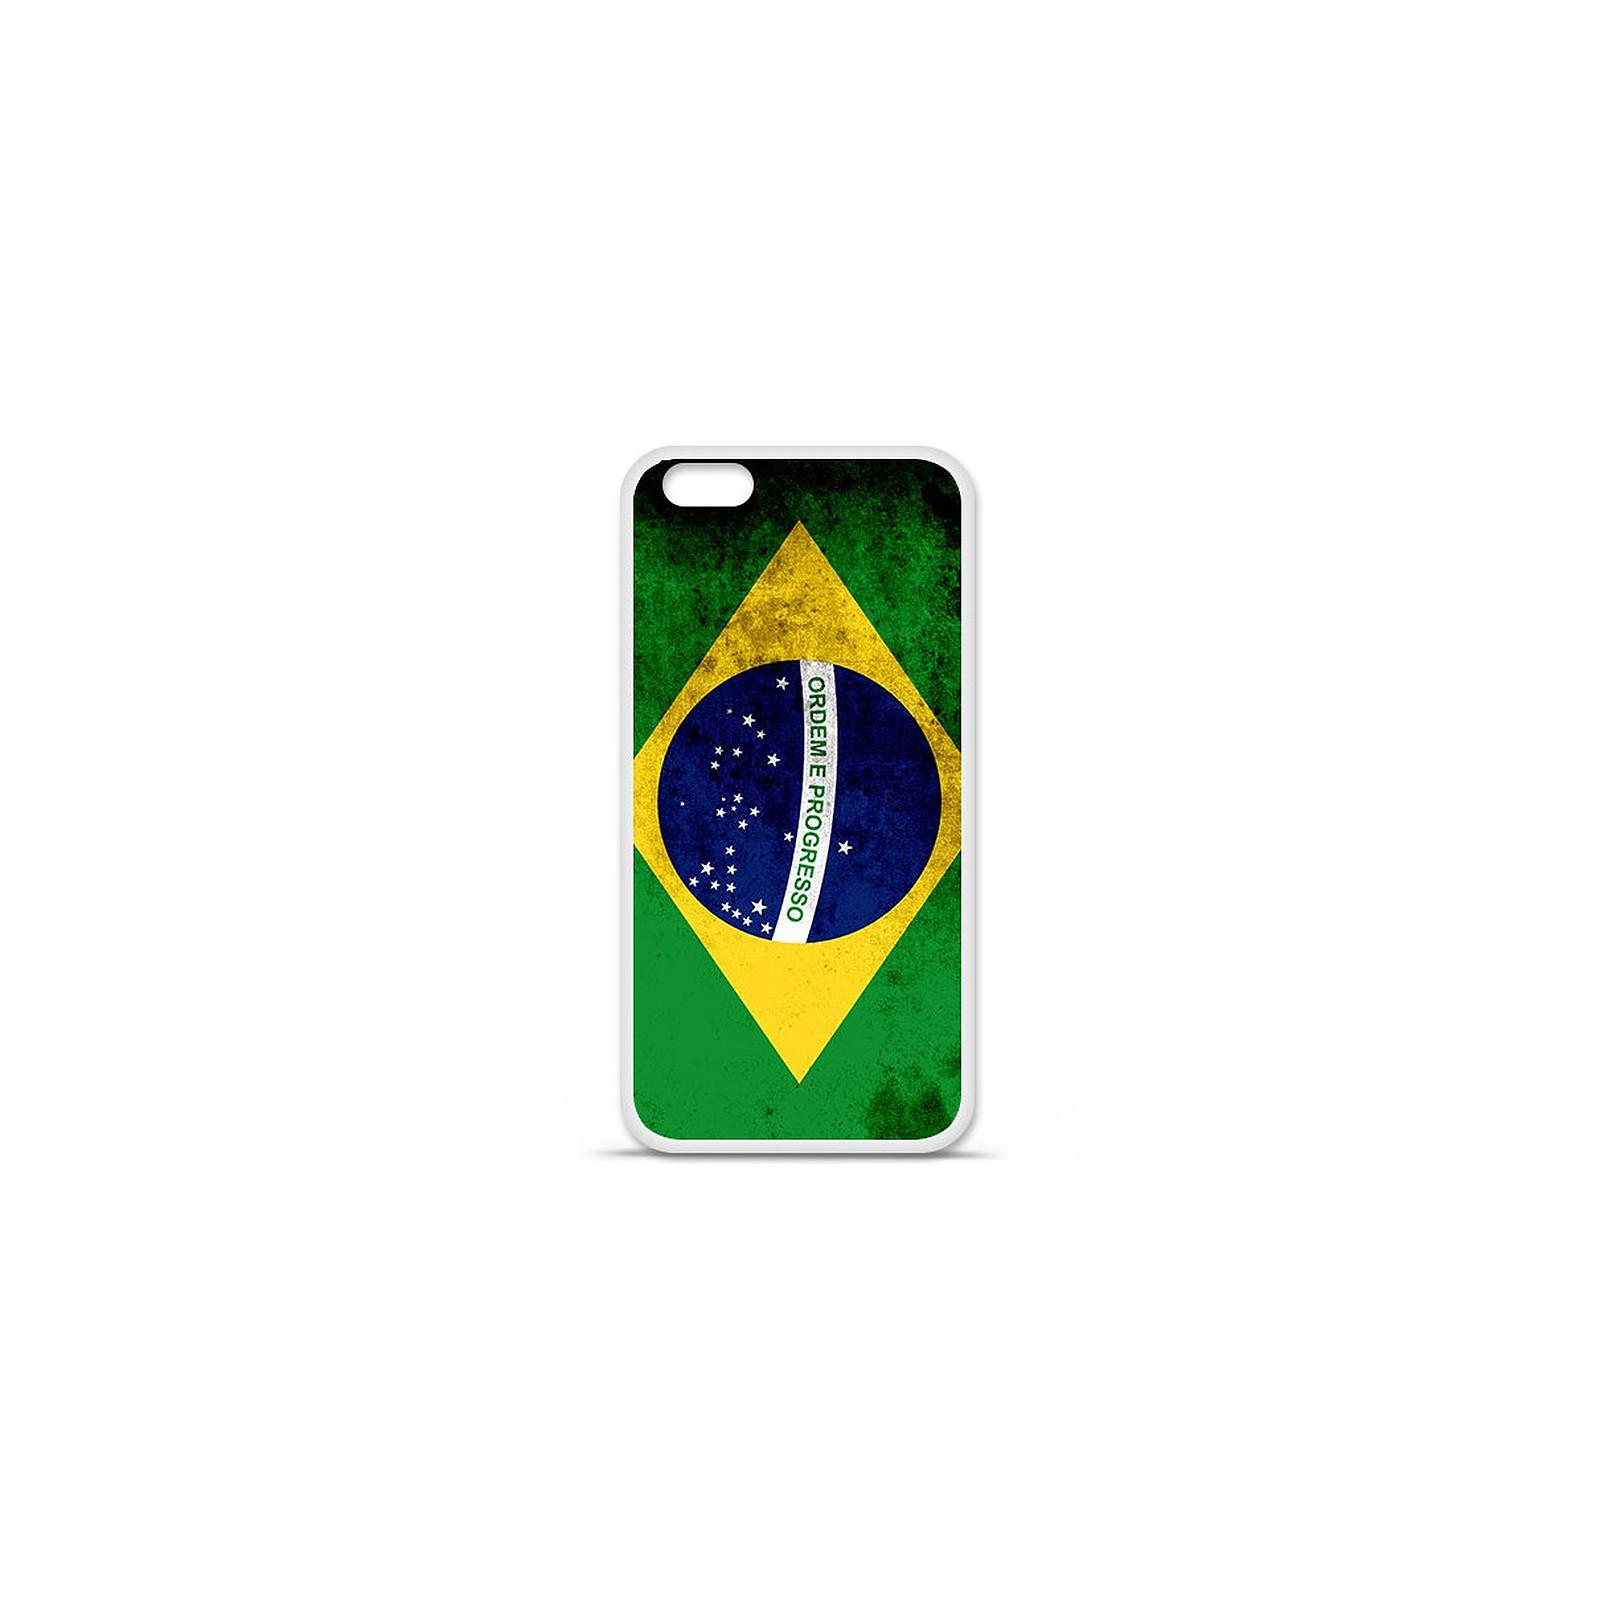 1001 Coques Coque silicone gel Apple IPhone 7 Plus motif Drapeau Brésil